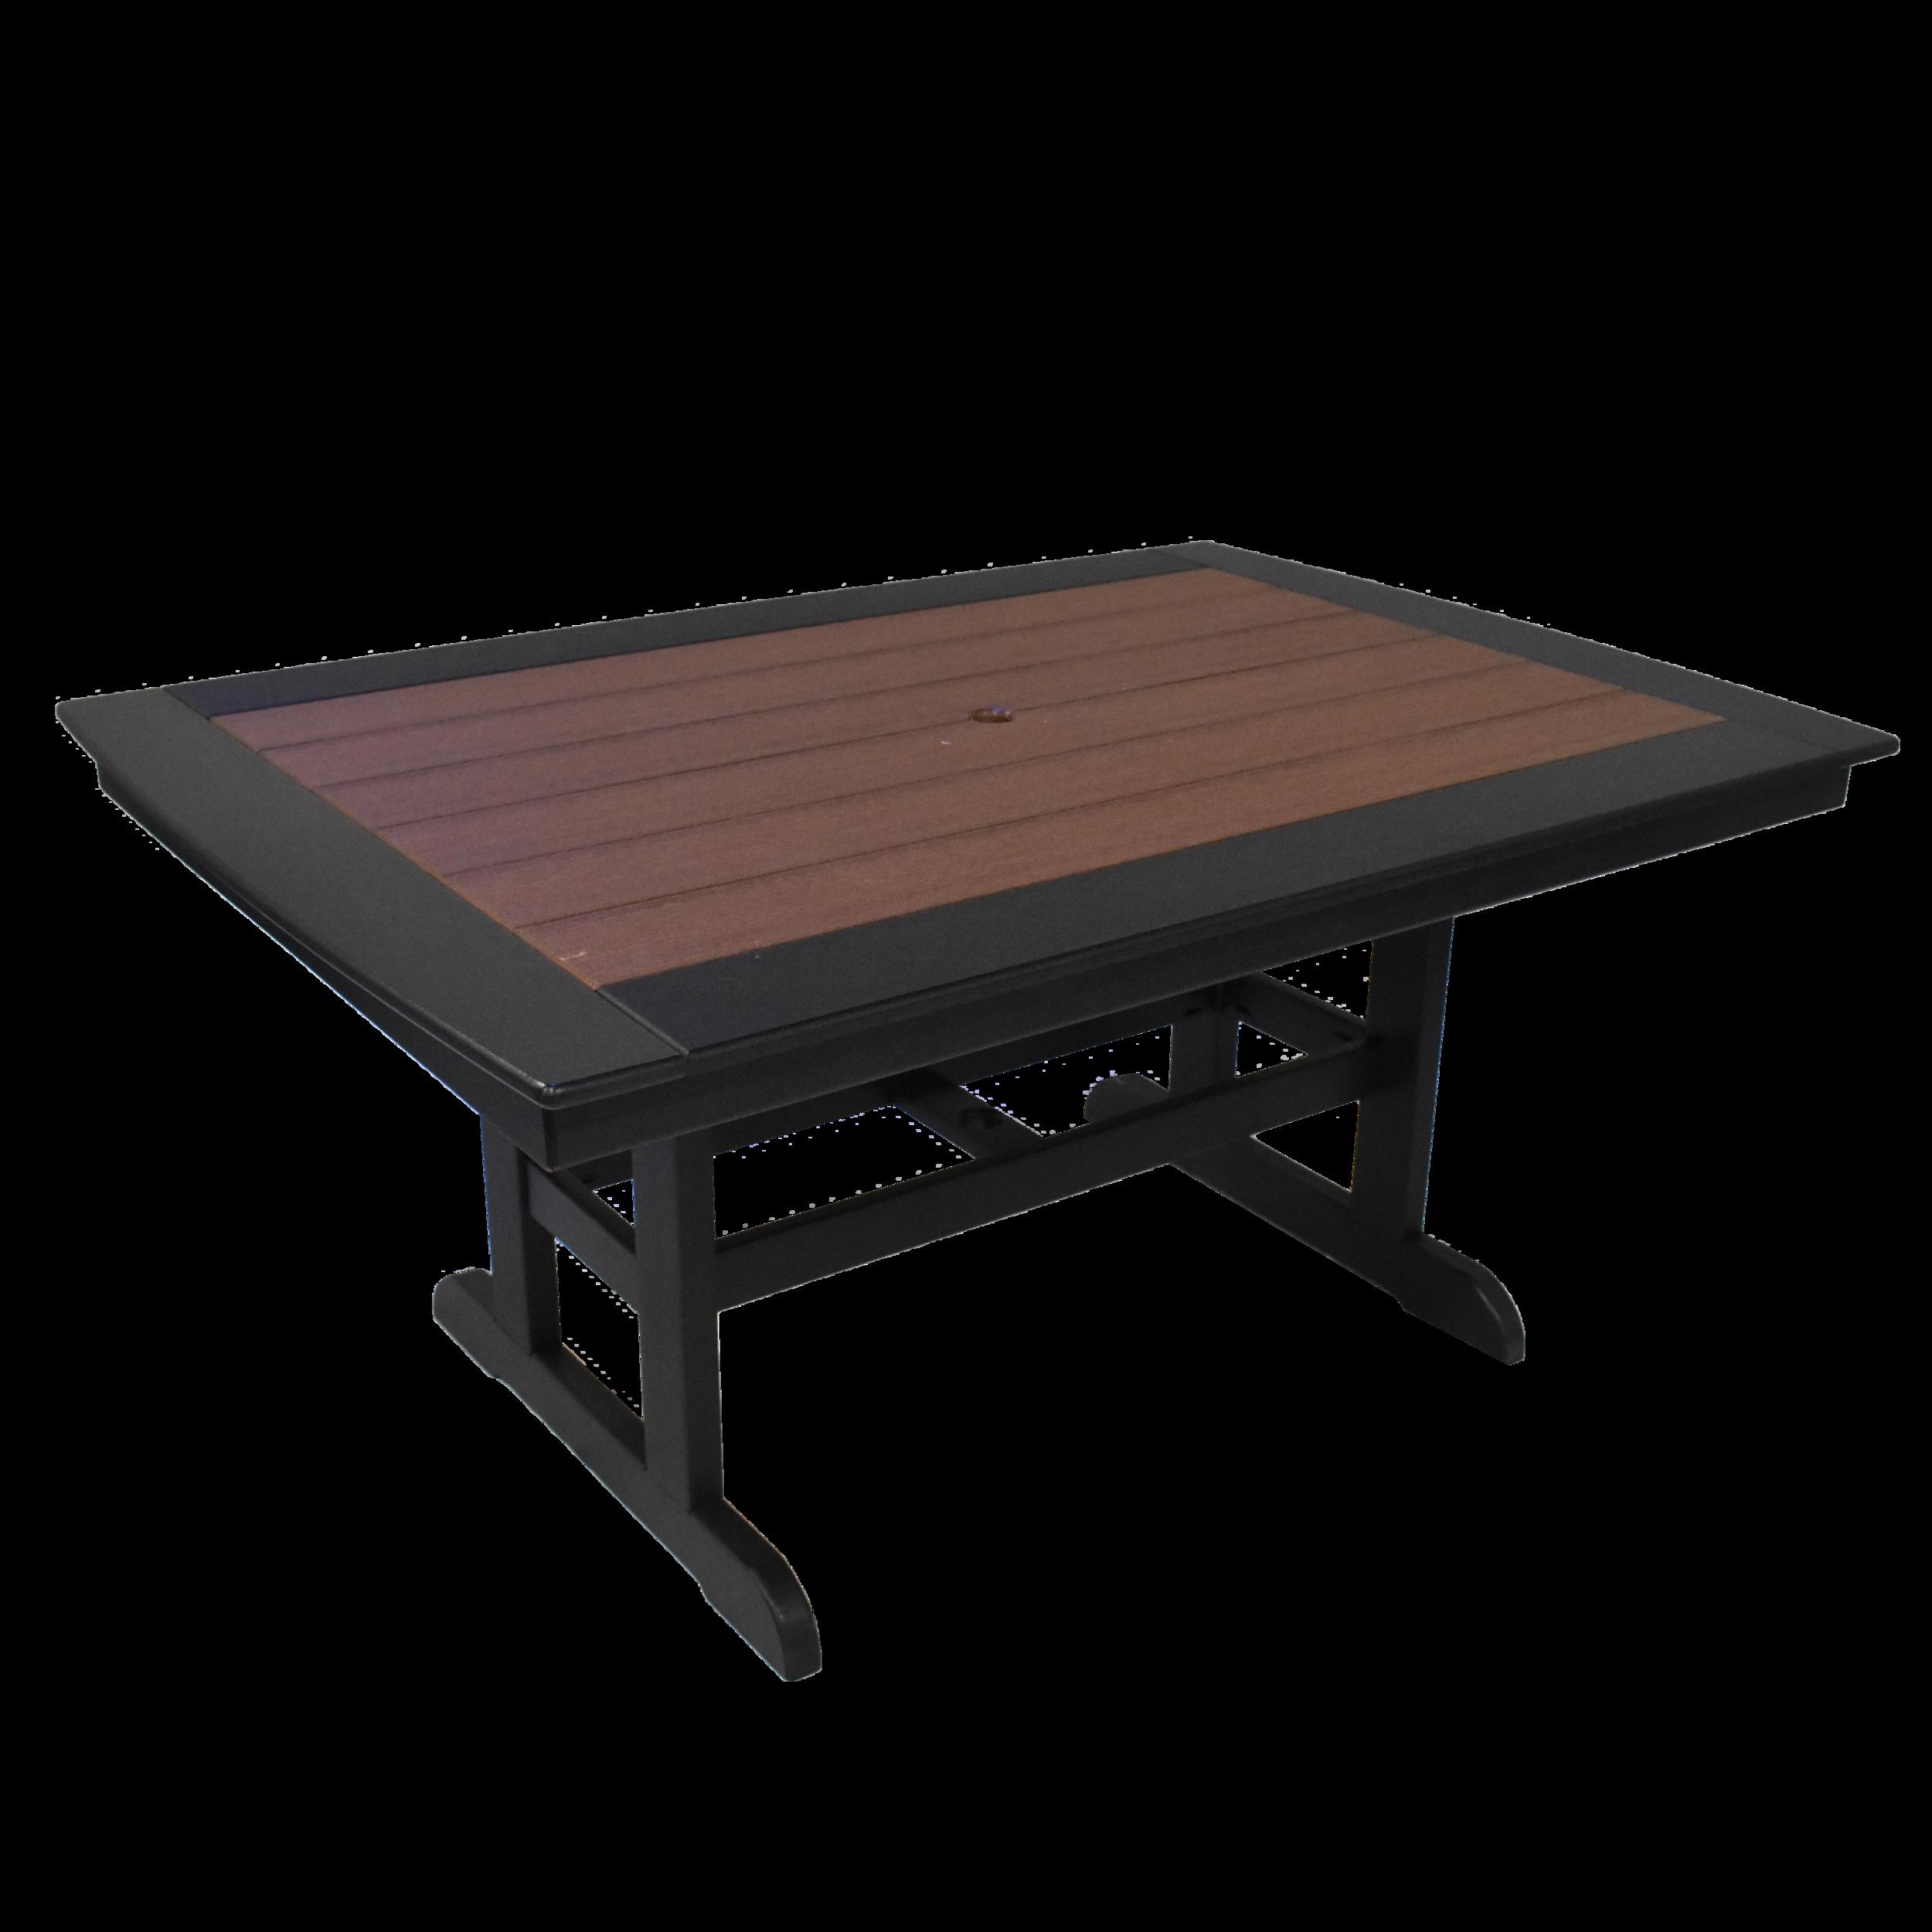 44x64 Dining Chair (W/Border)